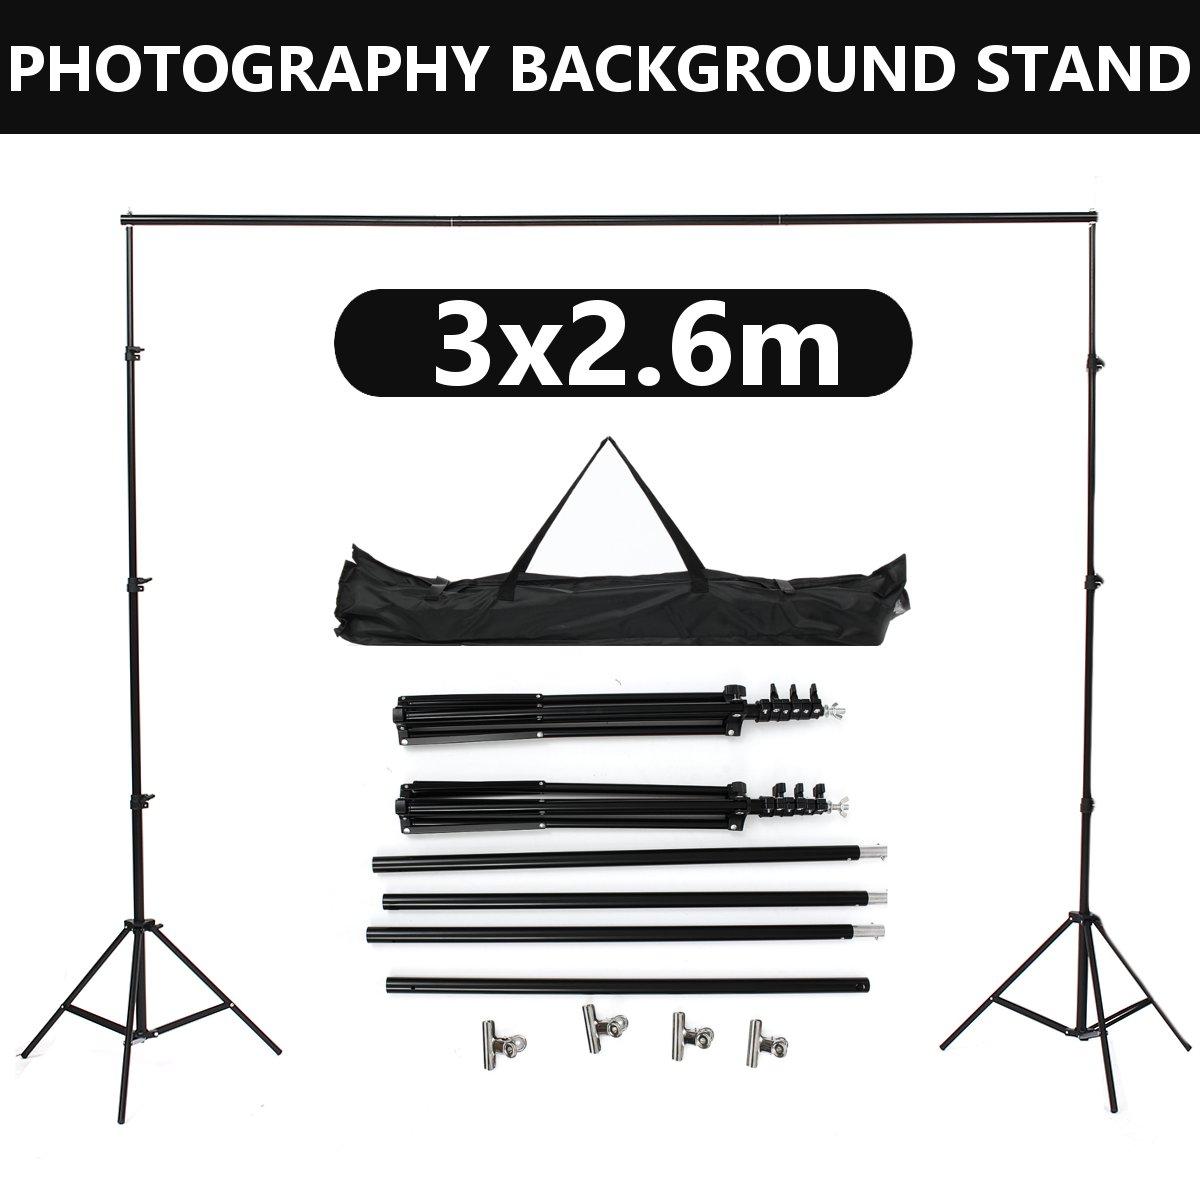 3x2,6 m sistema de soporte de fondo de aleación de aluminio Kit de soporte portátil estudio de fotografía telón de fondo conjunto de bolsa de transporte para lienzo de papel